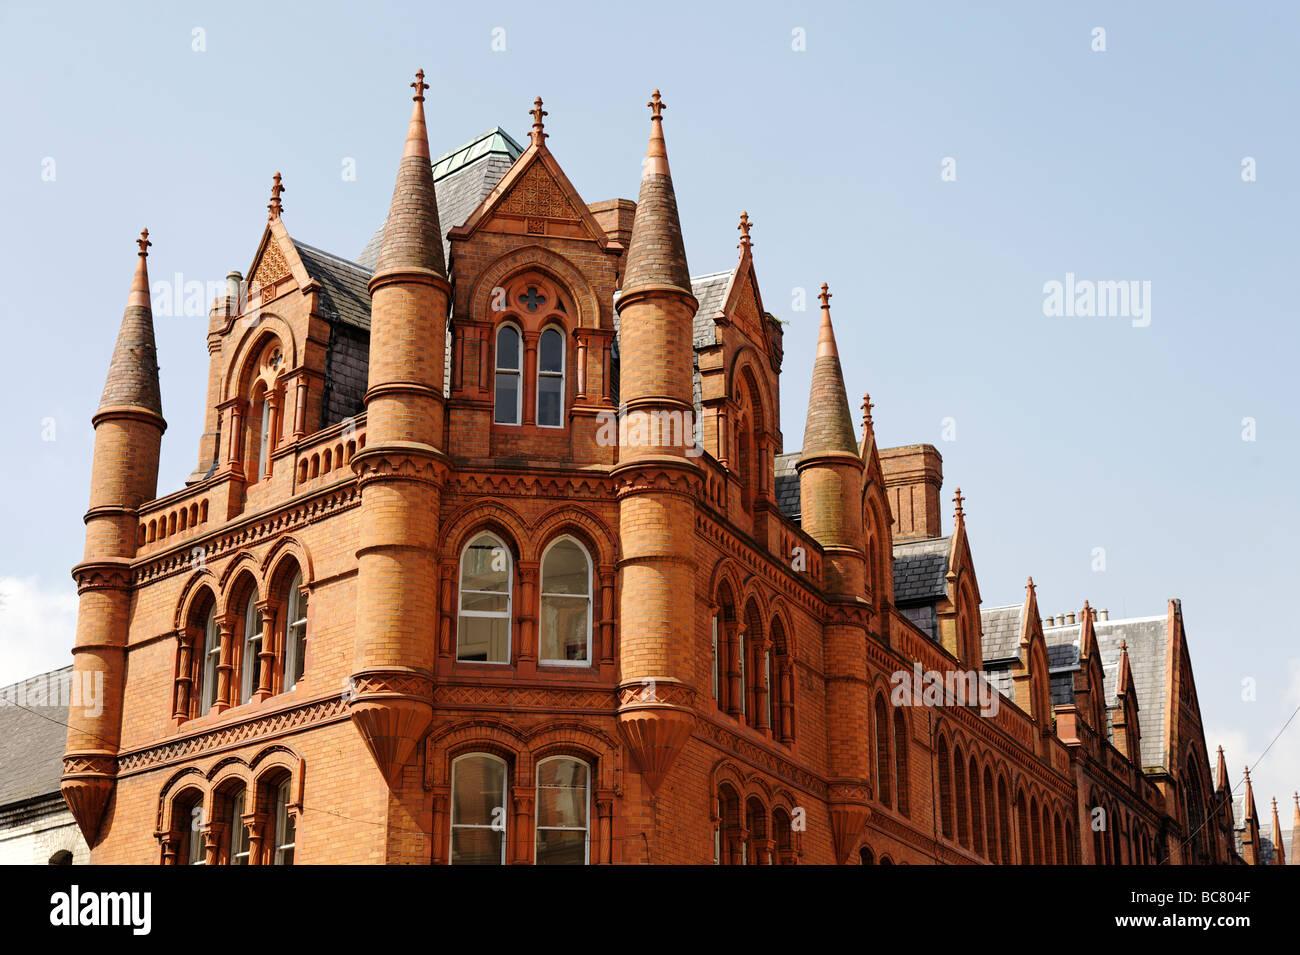 South City Market red brick building aka George s Street Arcade in Dublin Republic of Ireland - Stock Image